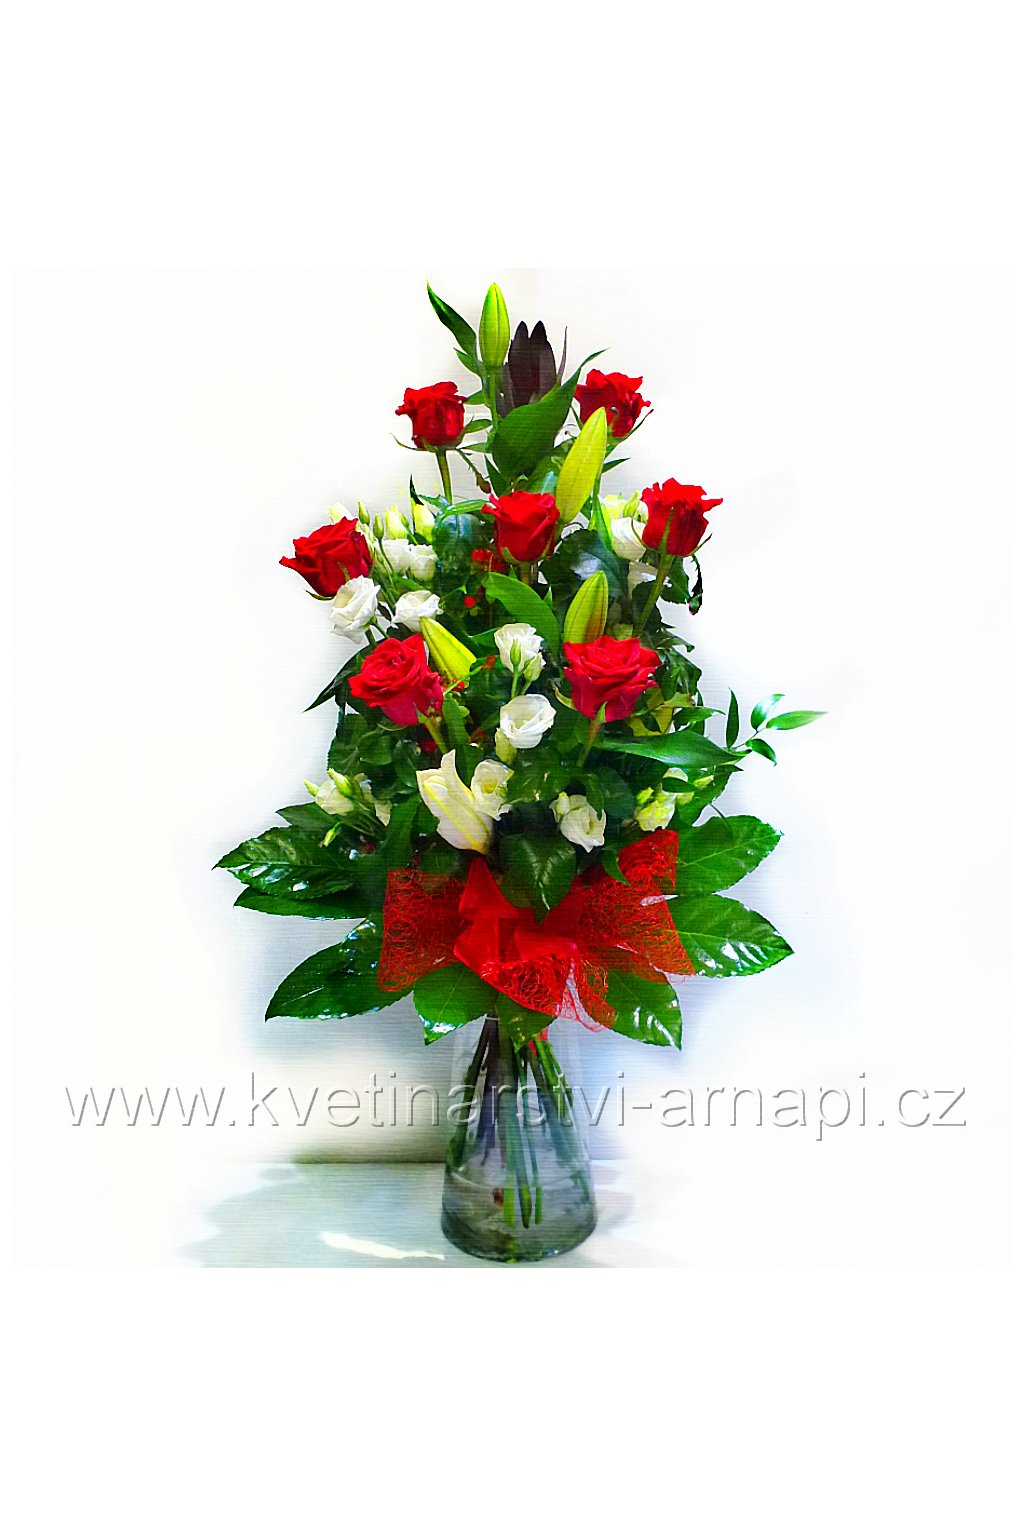 kvetinarstvi arnapi online darkove kytice ruze